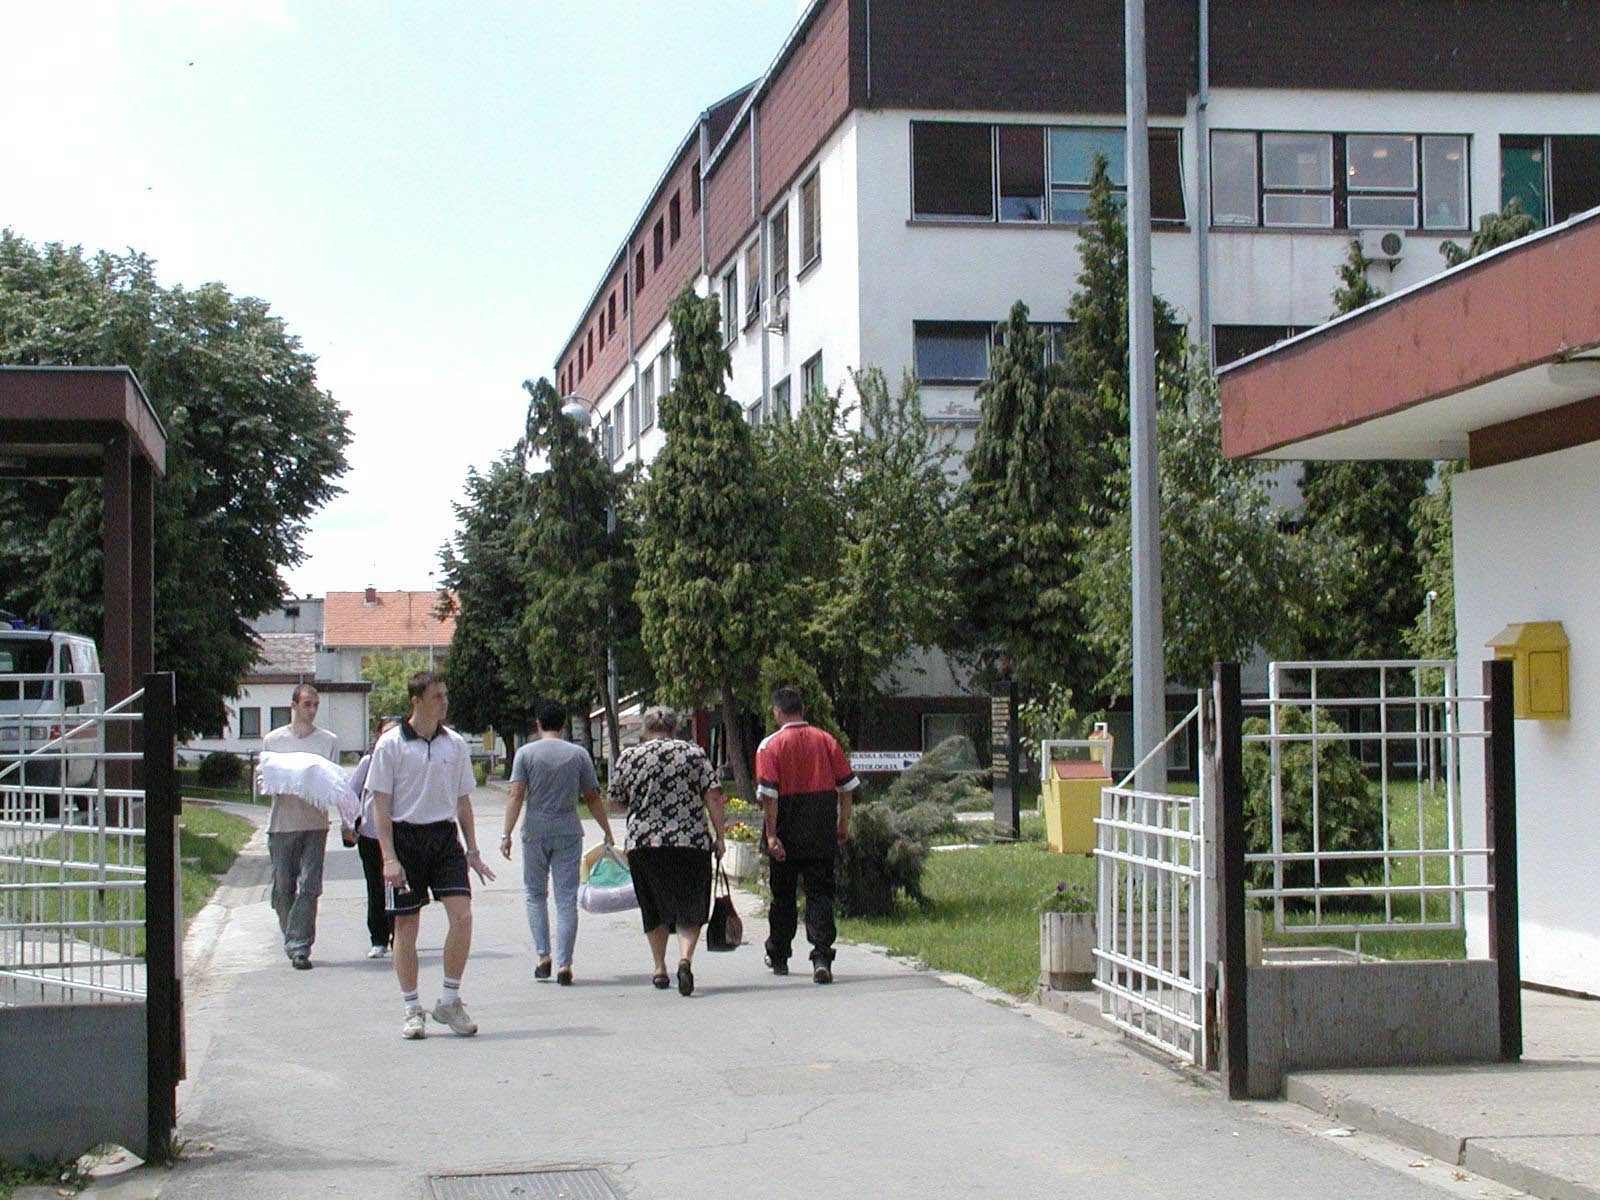 vukovar,020601 ulaz u vu bolnica snimio damir glibnusic -pok-